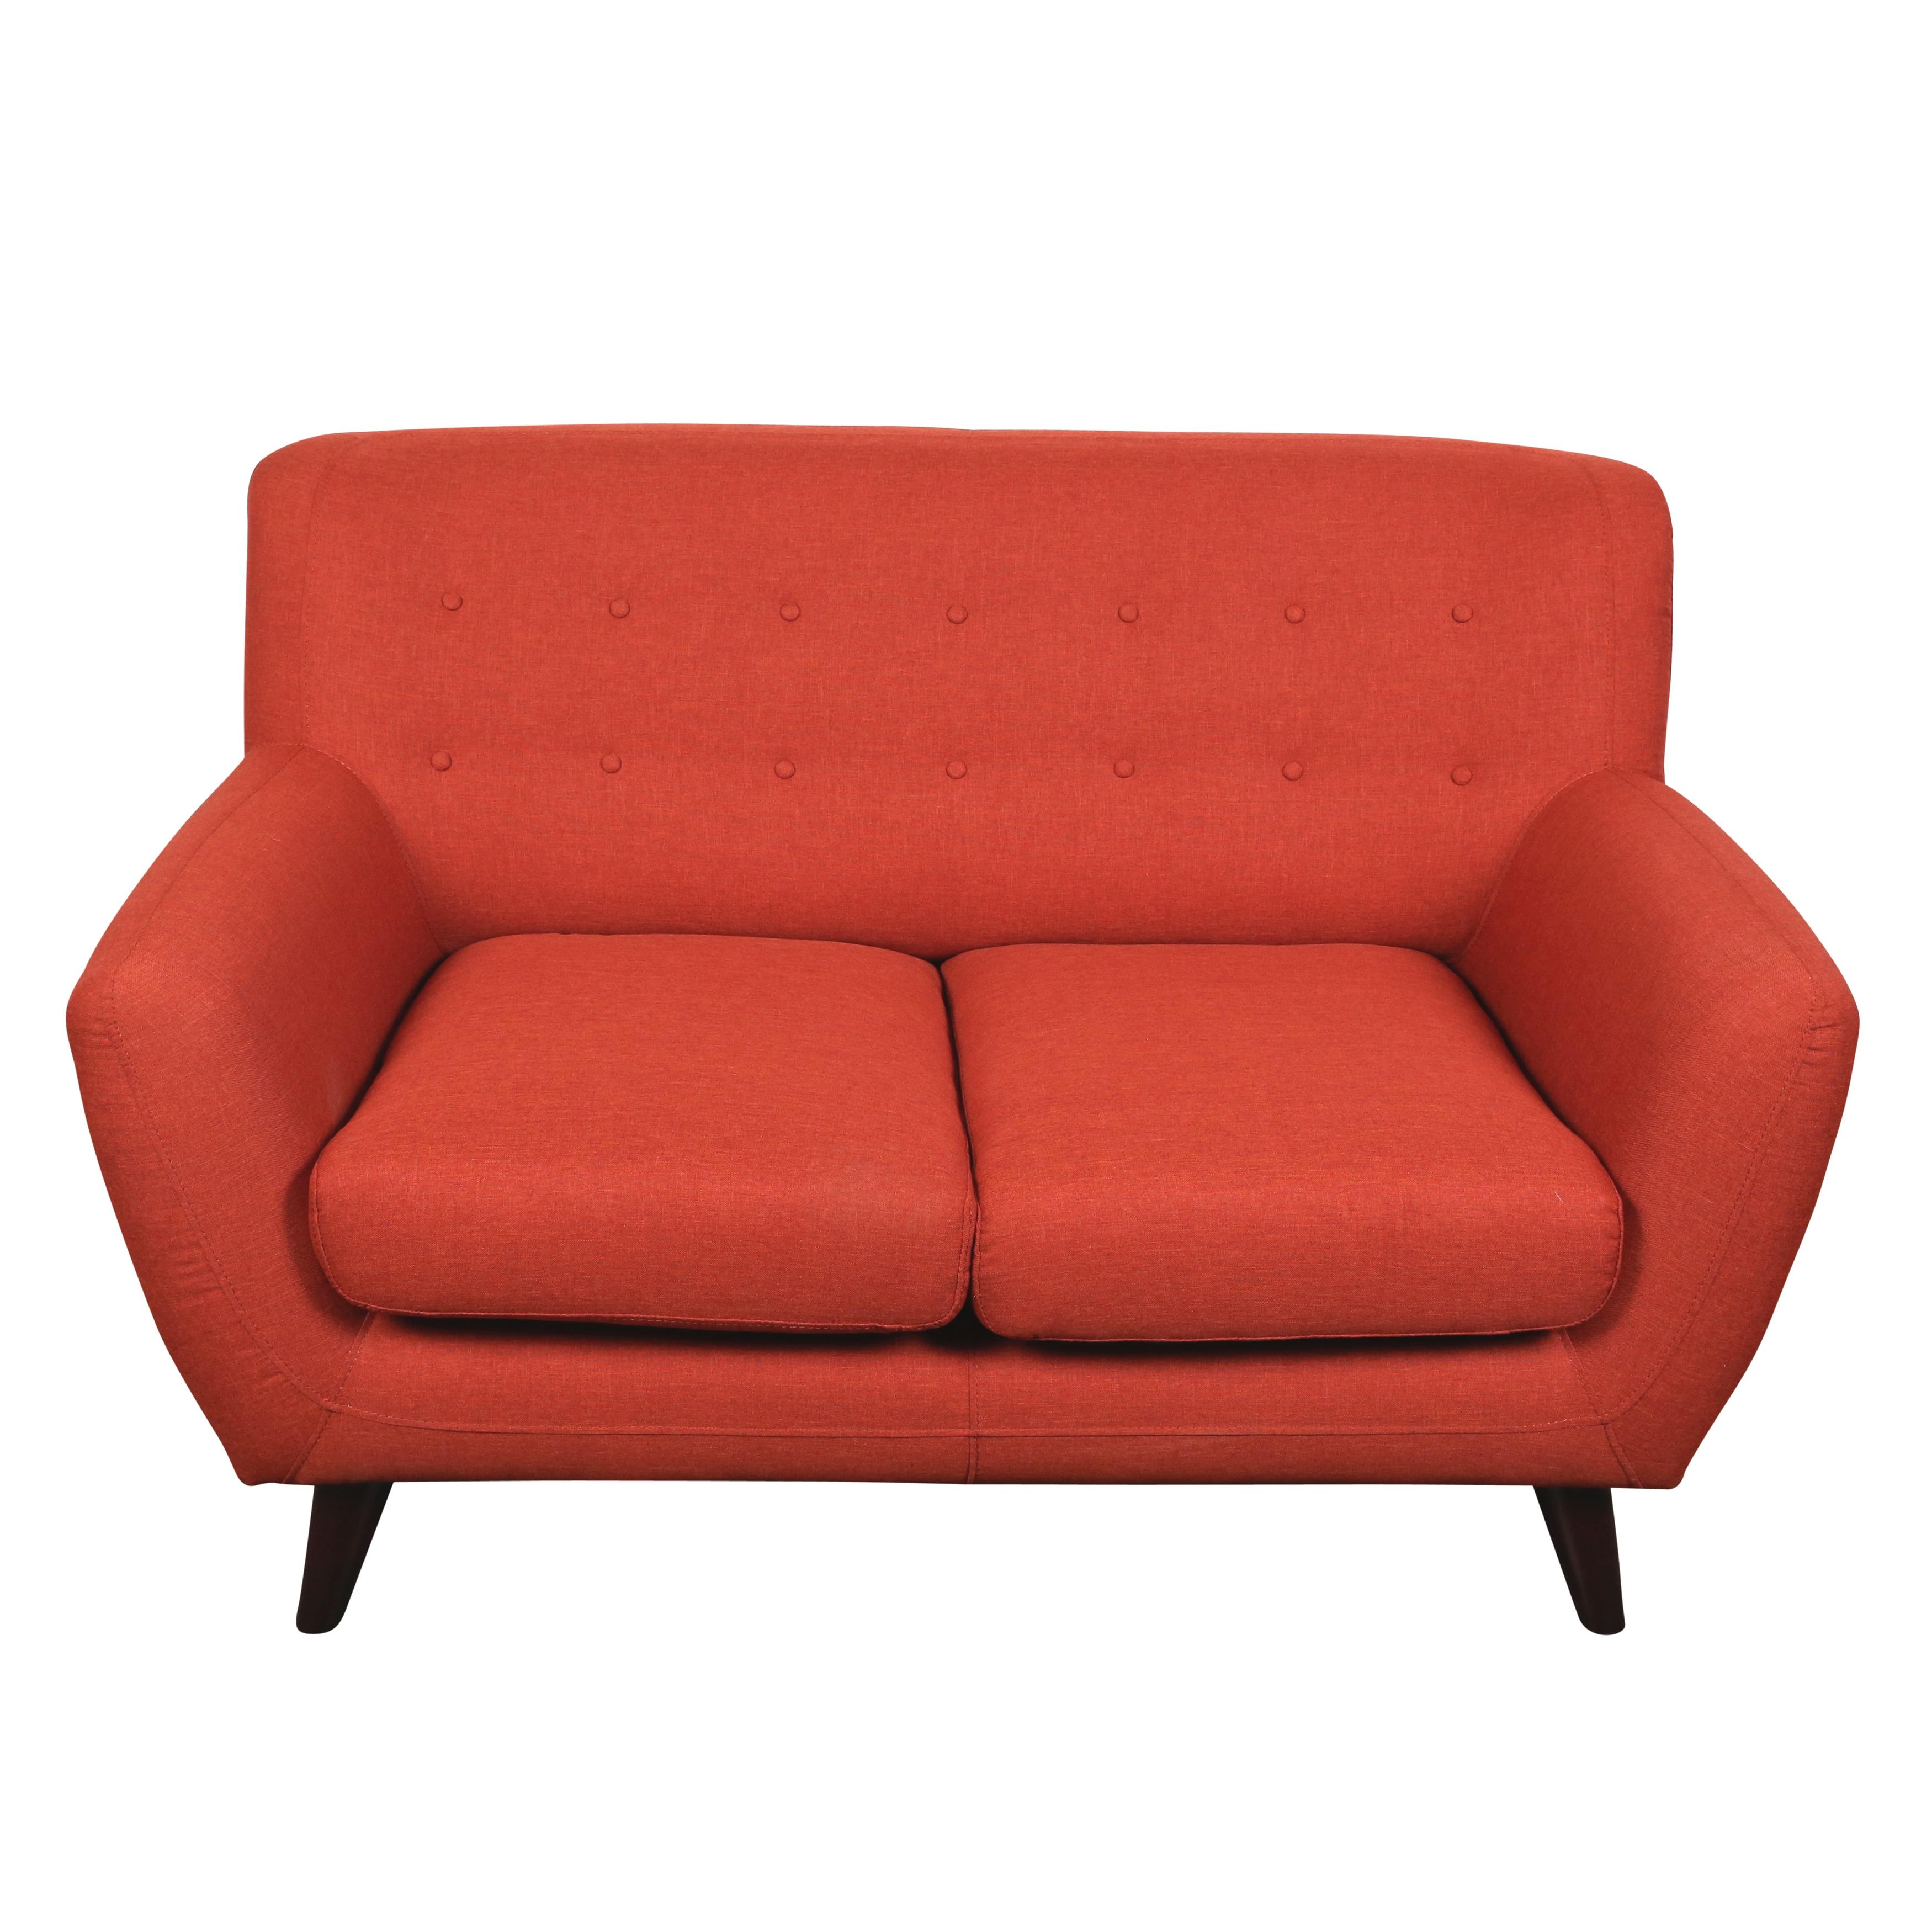 Porter E Pumpkin Orange Mid Century Modern Loveseat On Free Shipping Today 12049987